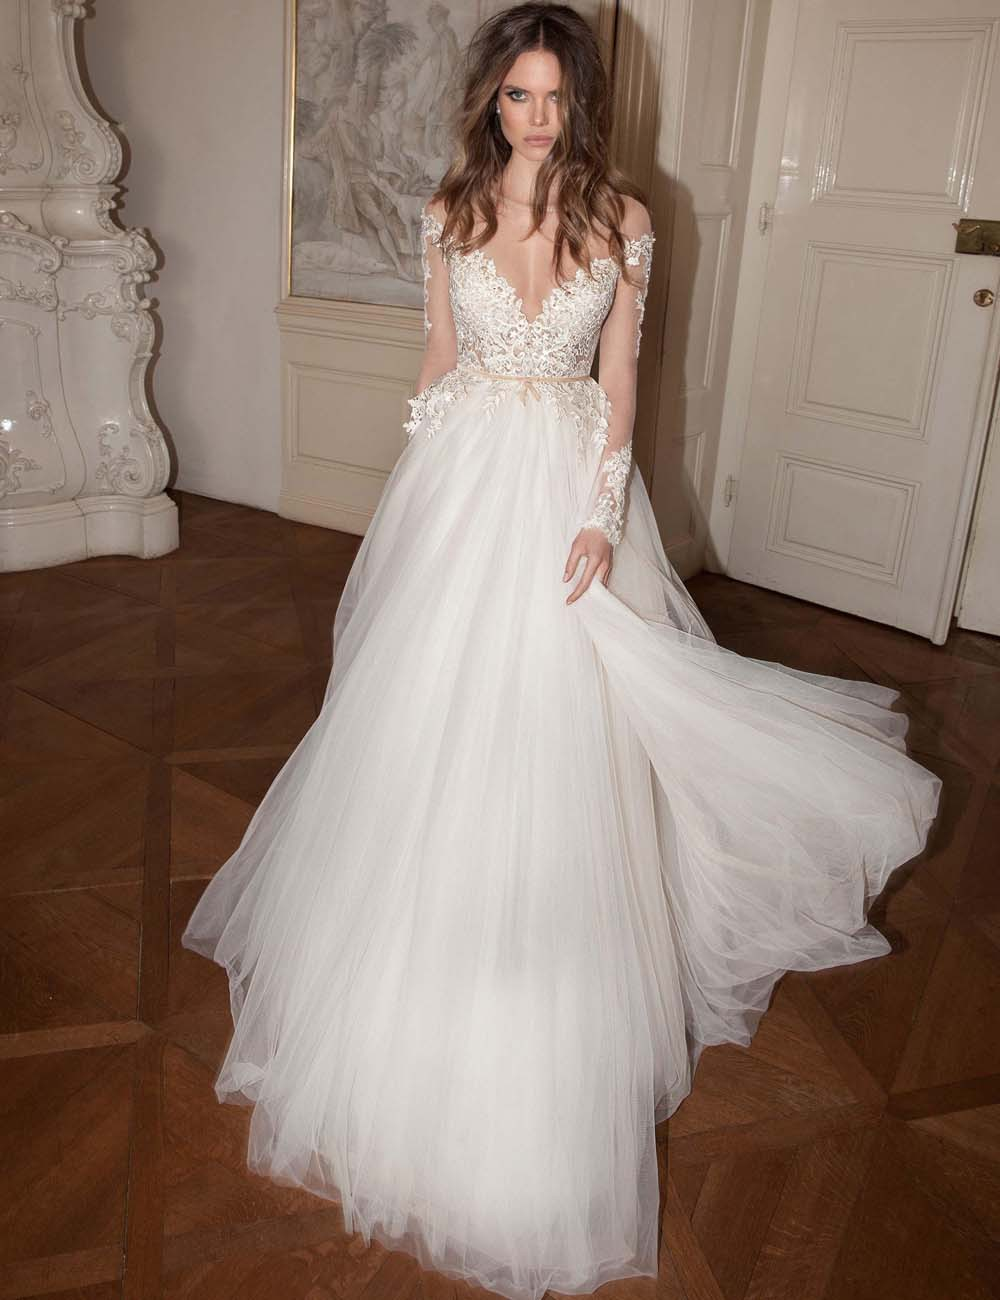 2018 Sexy Illusion Fall Backless Bridal Gown Long Sleeve Appliques Floor Length Sheer Neck Vestidos De Noiva Bridesmaid Dresses